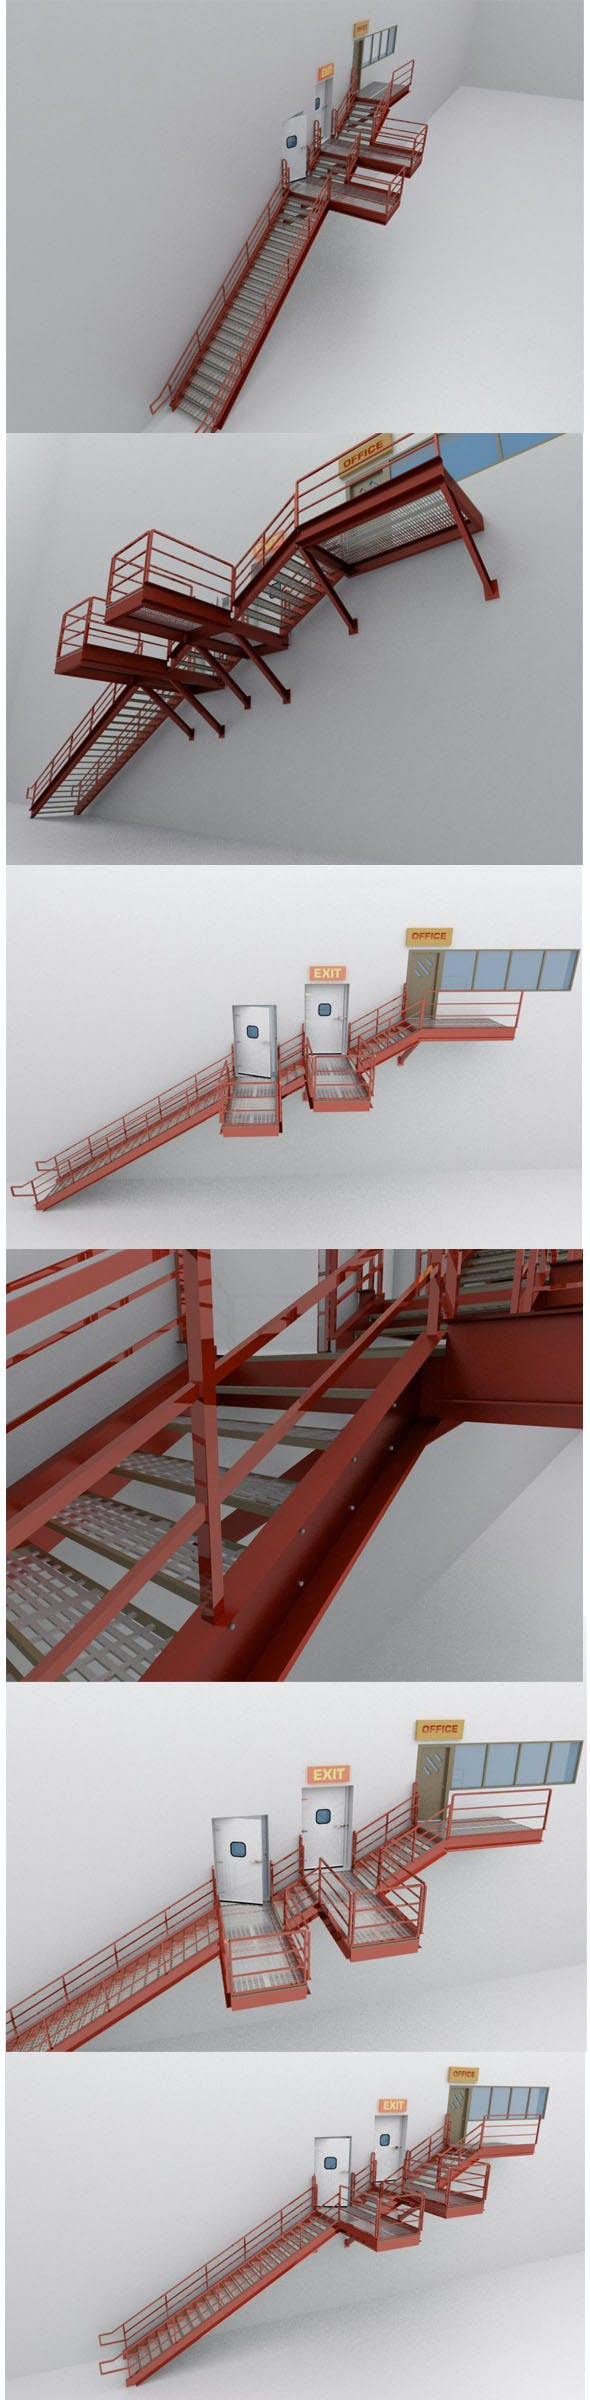 Factory's Metal Stairs - 3DOcean Item for Sale